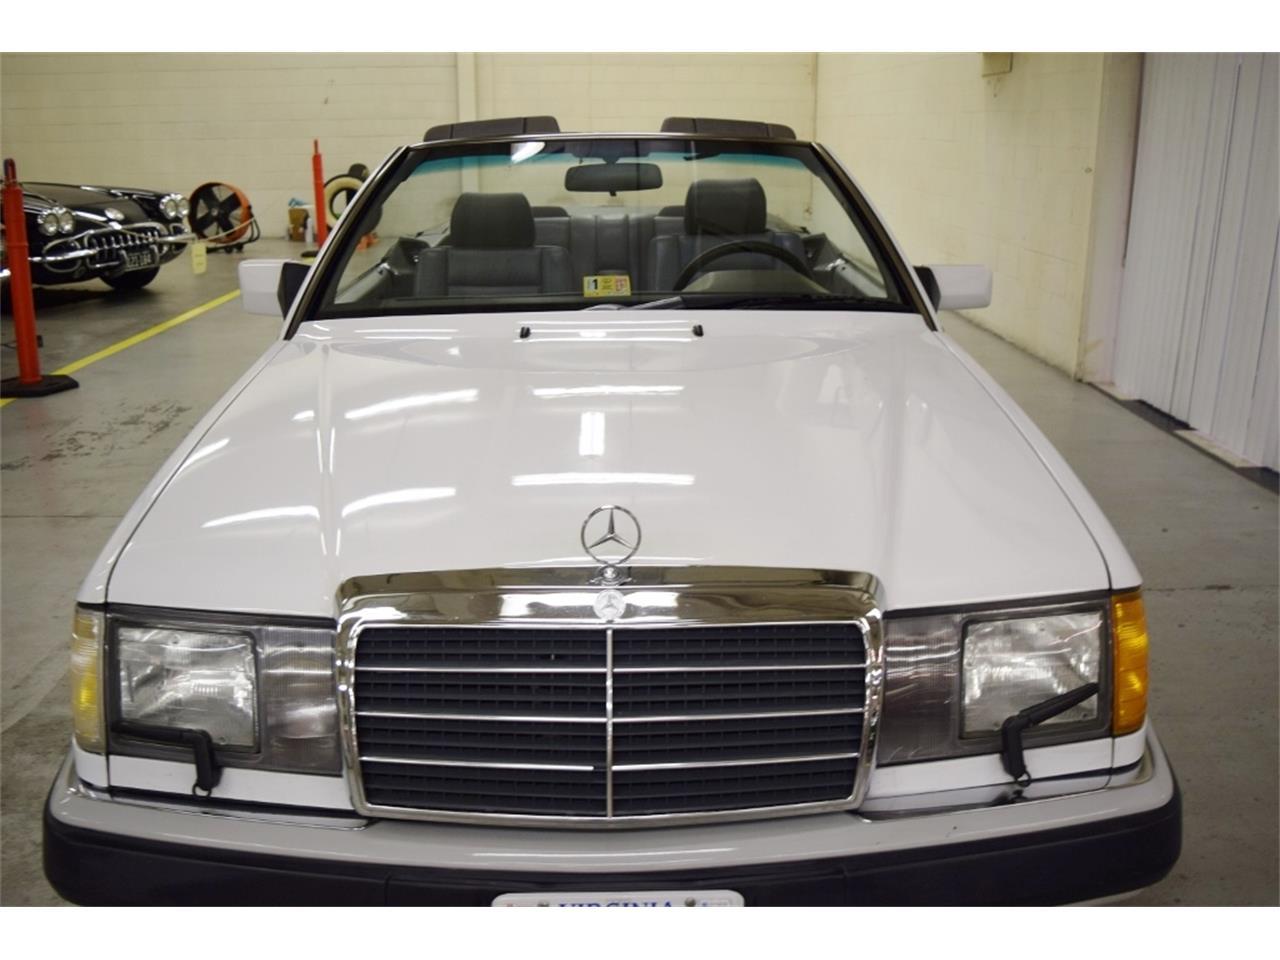 Large Picture of '93 Mercedes-Benz 300CE located in Fredericksburg Virginia - $15,900.00 - ONU8